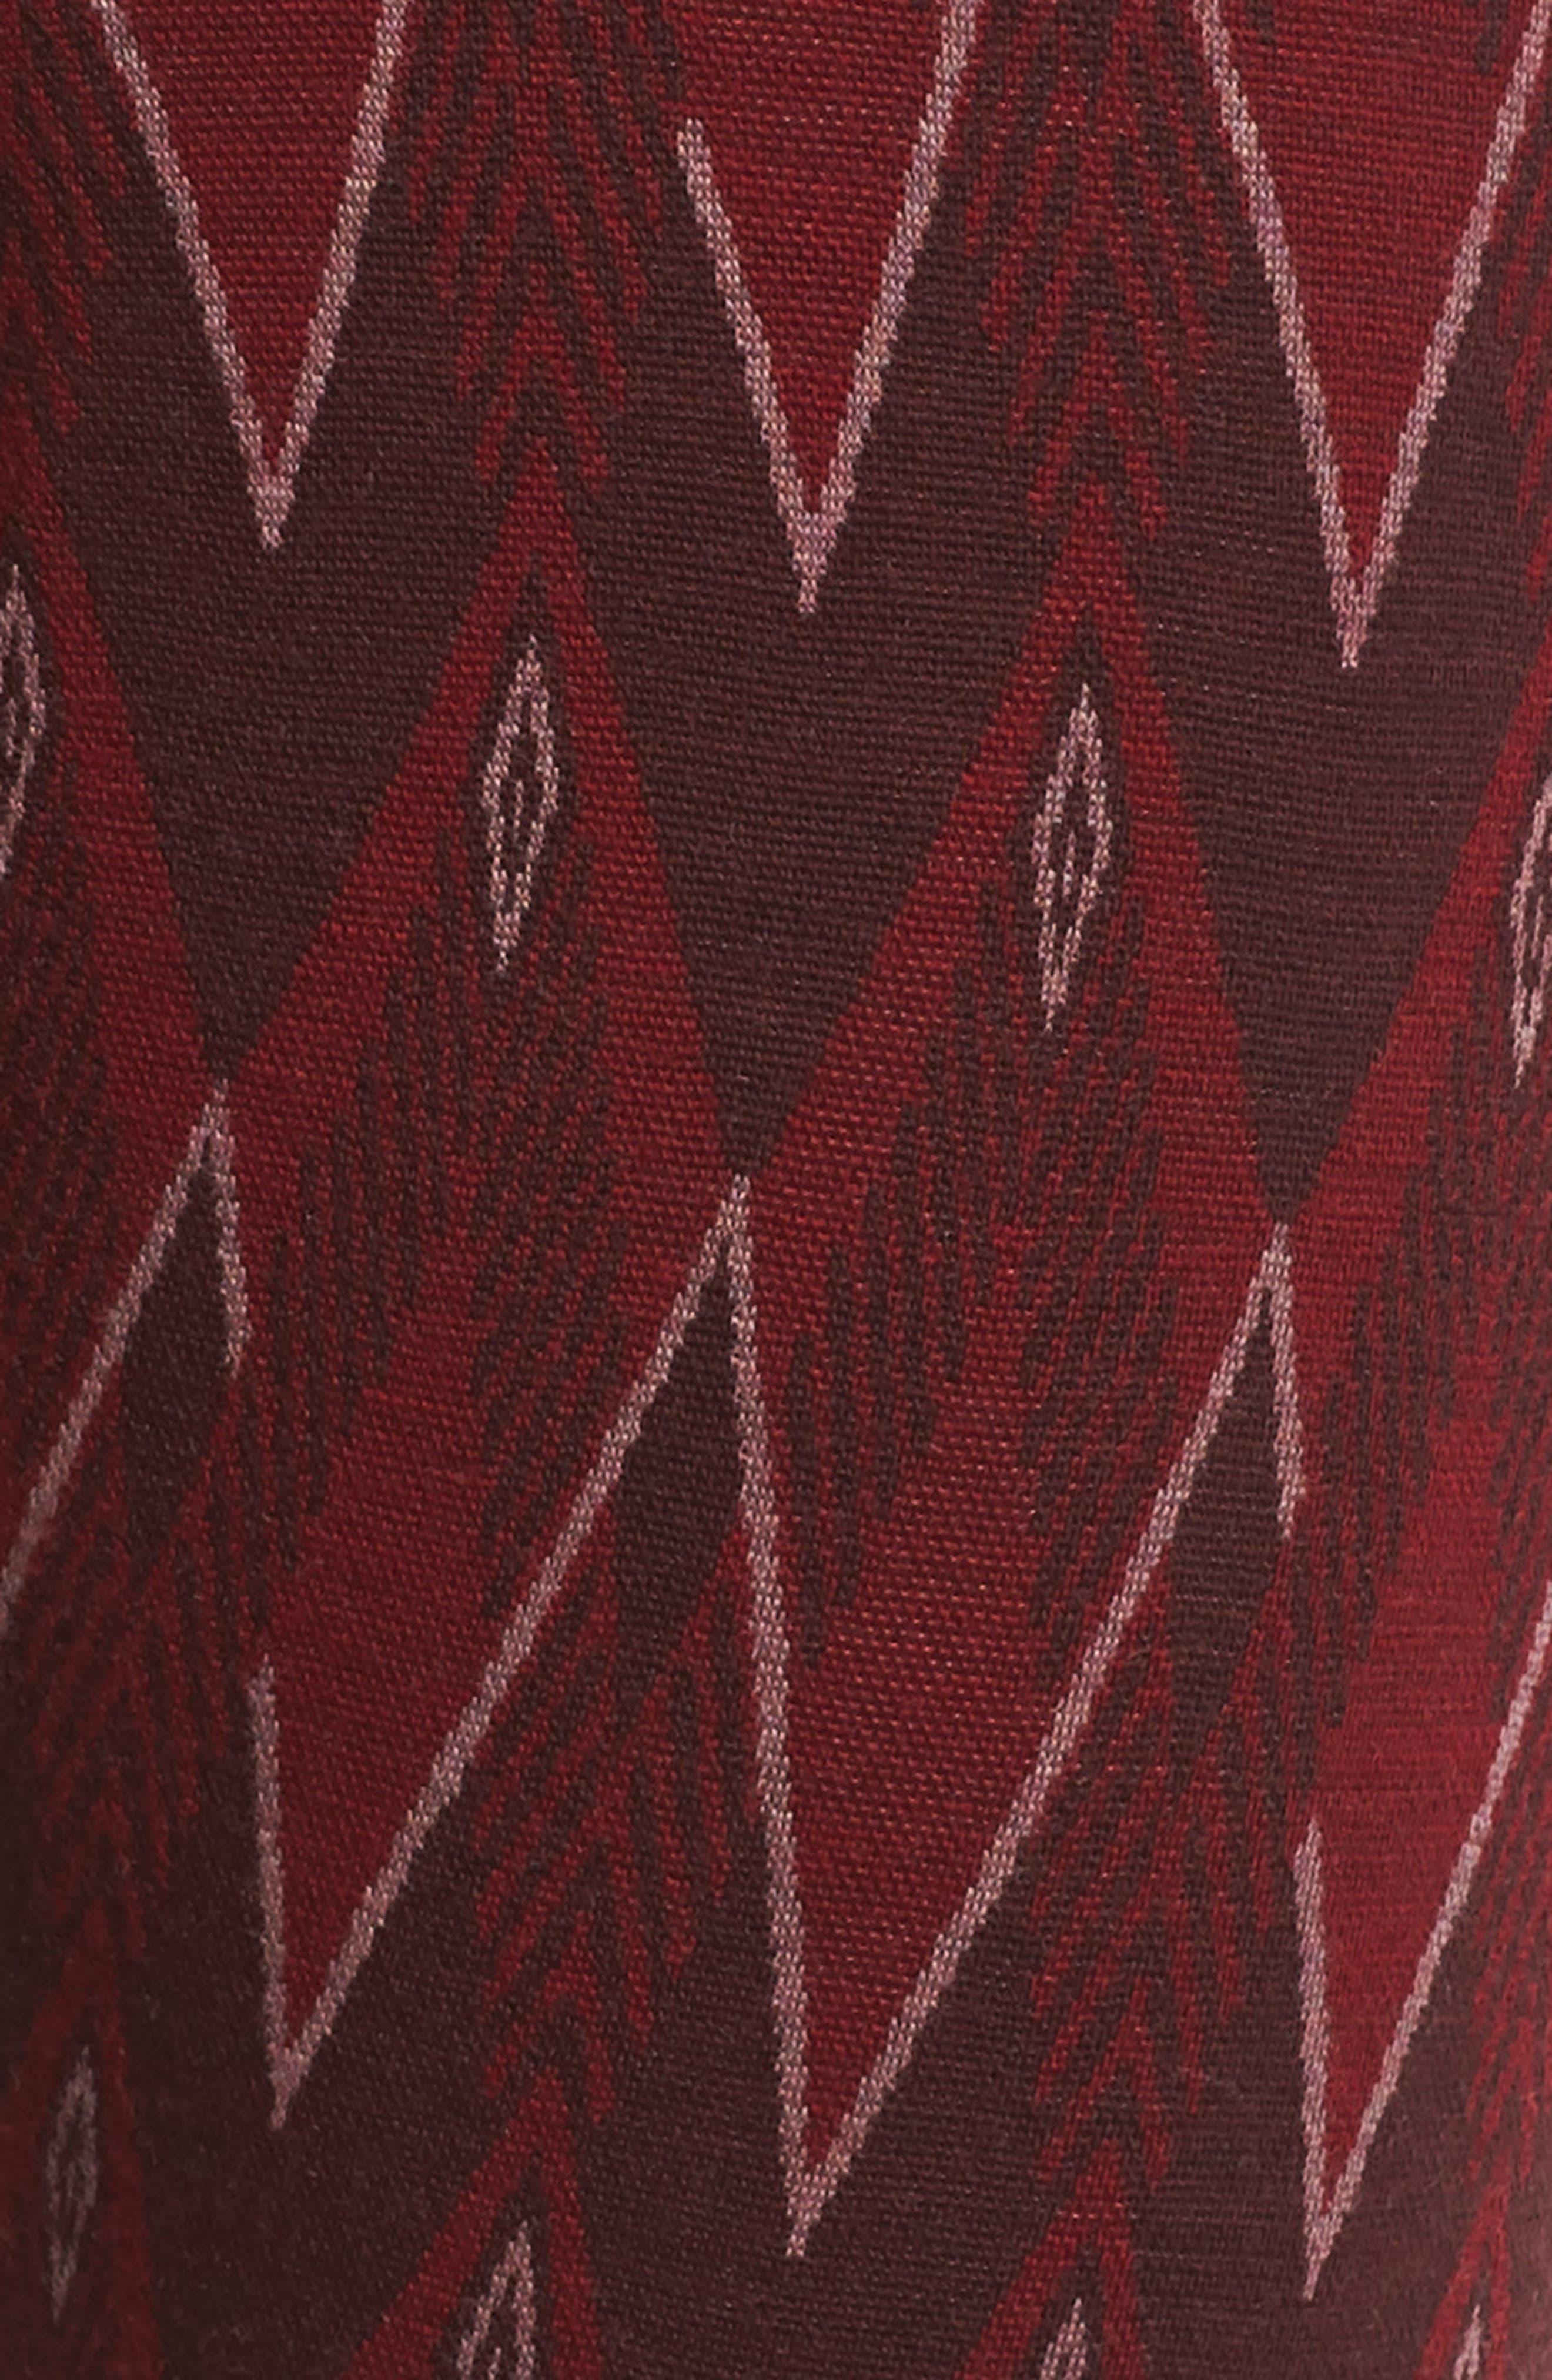 Merino 250 Base Layer Pattern Bottoms,                             Alternate thumbnail 6, color,                             TIBETAN RED